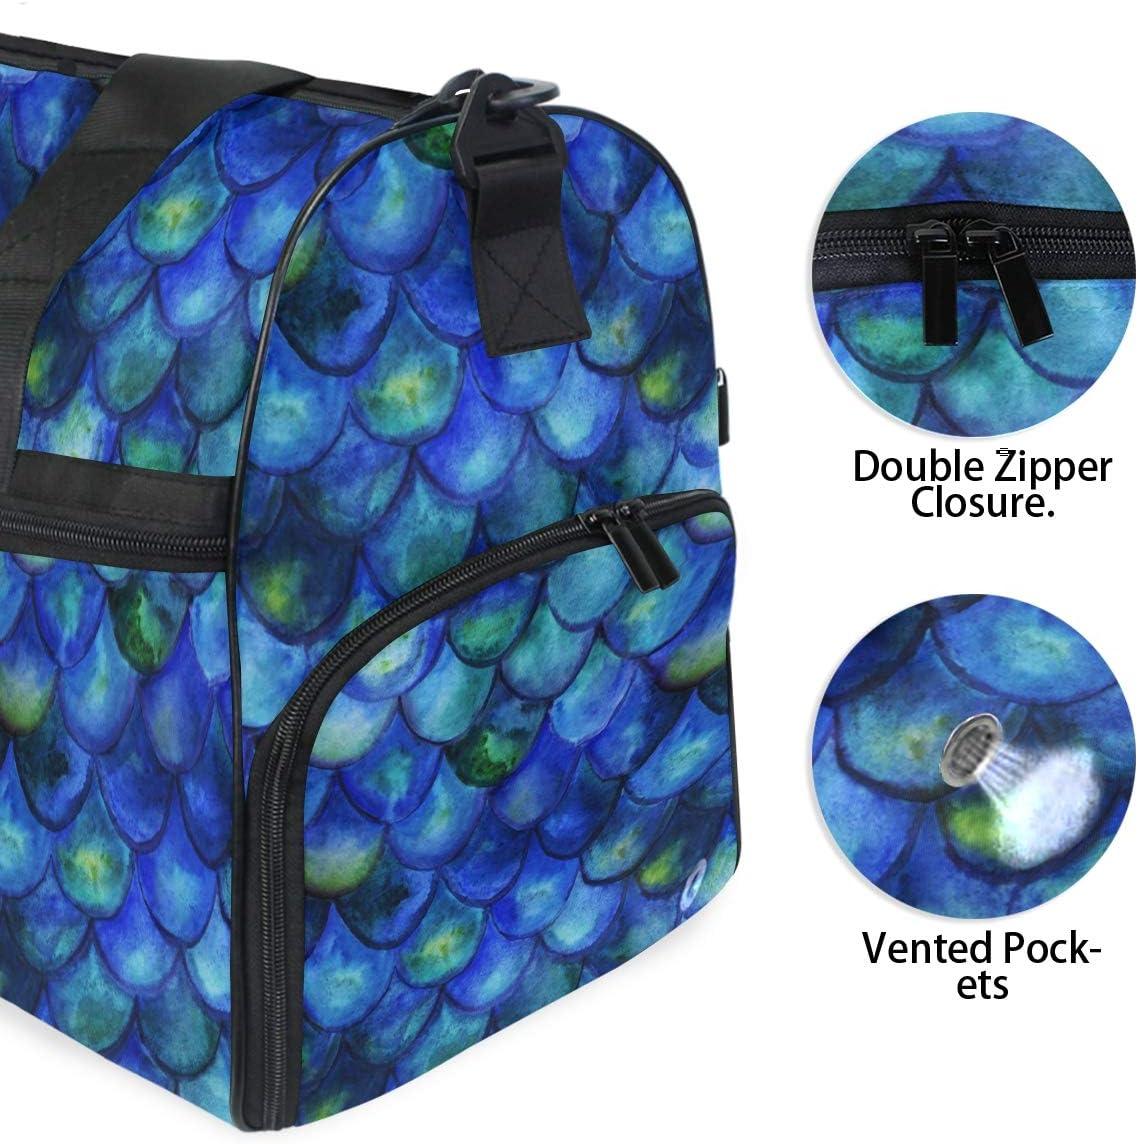 ALAZA Vintage Blue Mermaid Tale Sports Gym Duffel Bag Travel Luggage Handbag Shoulder Bag with Shoes Compartment for Men Women